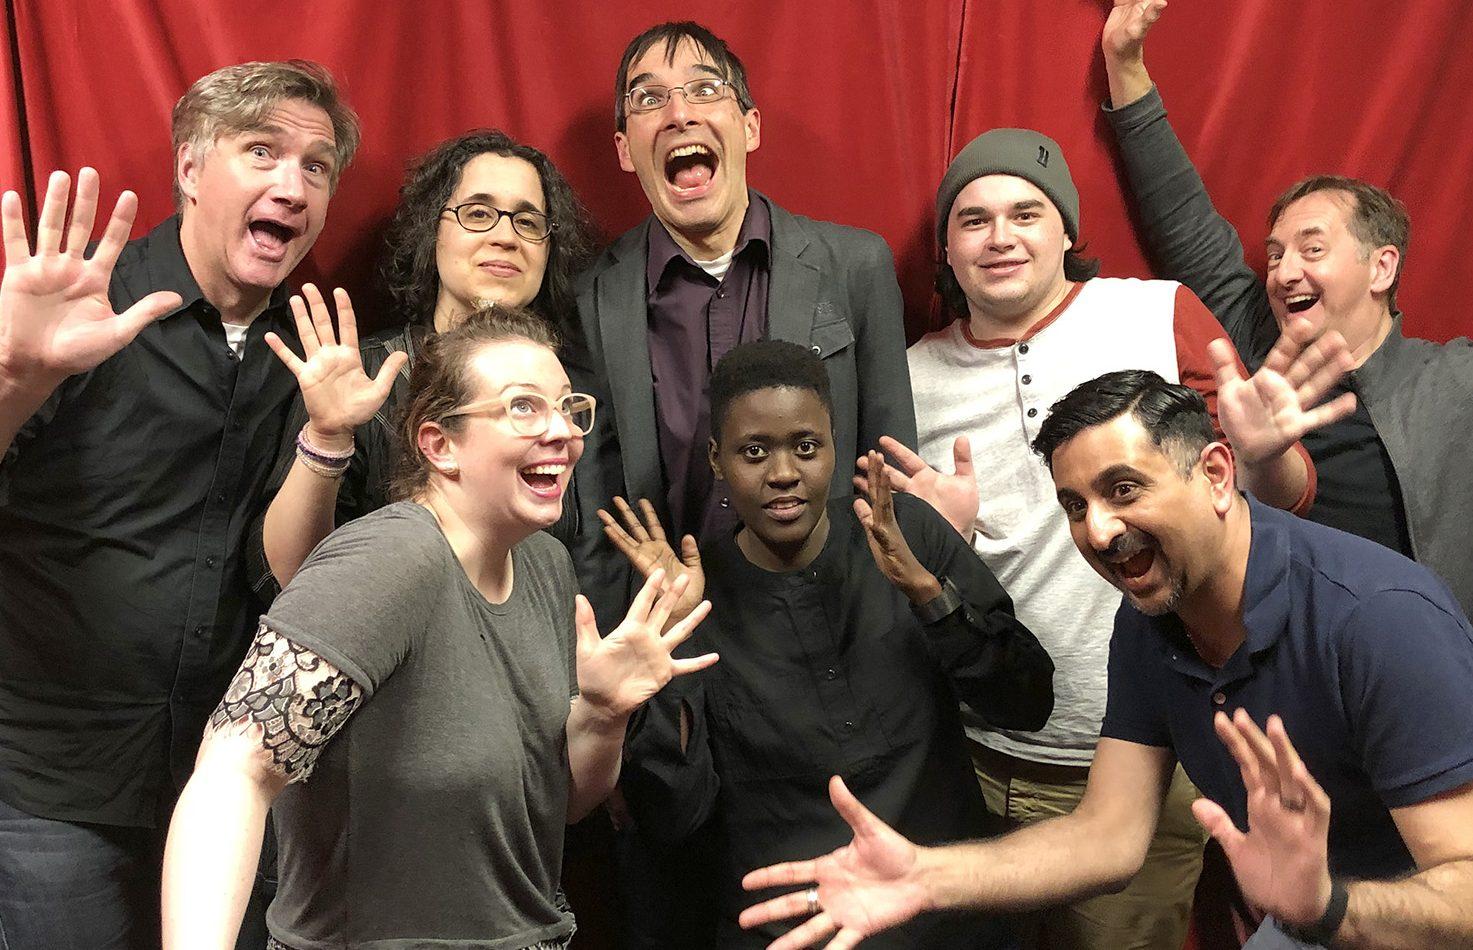 Back row: Phil, Lisa, Frank, Micah, and Michael. Front row: Vanessa, Ritah, and Neel